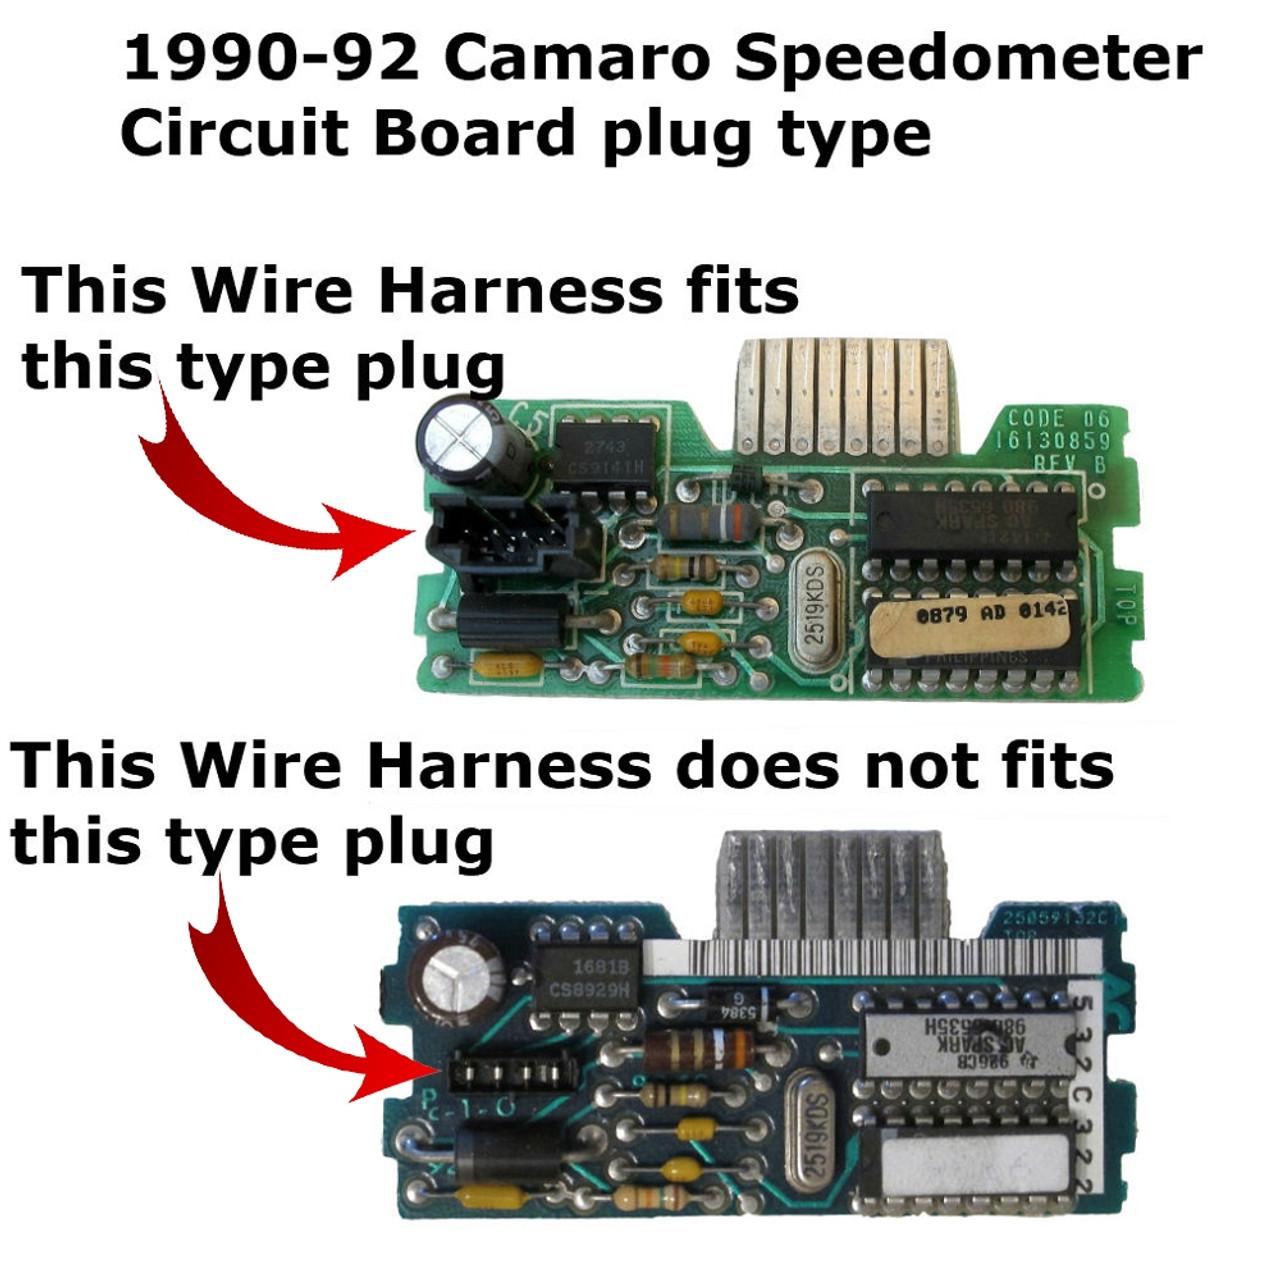 1990 92 chevy camaro speedometer wire harness plug type 2 1990 92 chevy camaro speedometer [ 1280 x 1280 Pixel ]